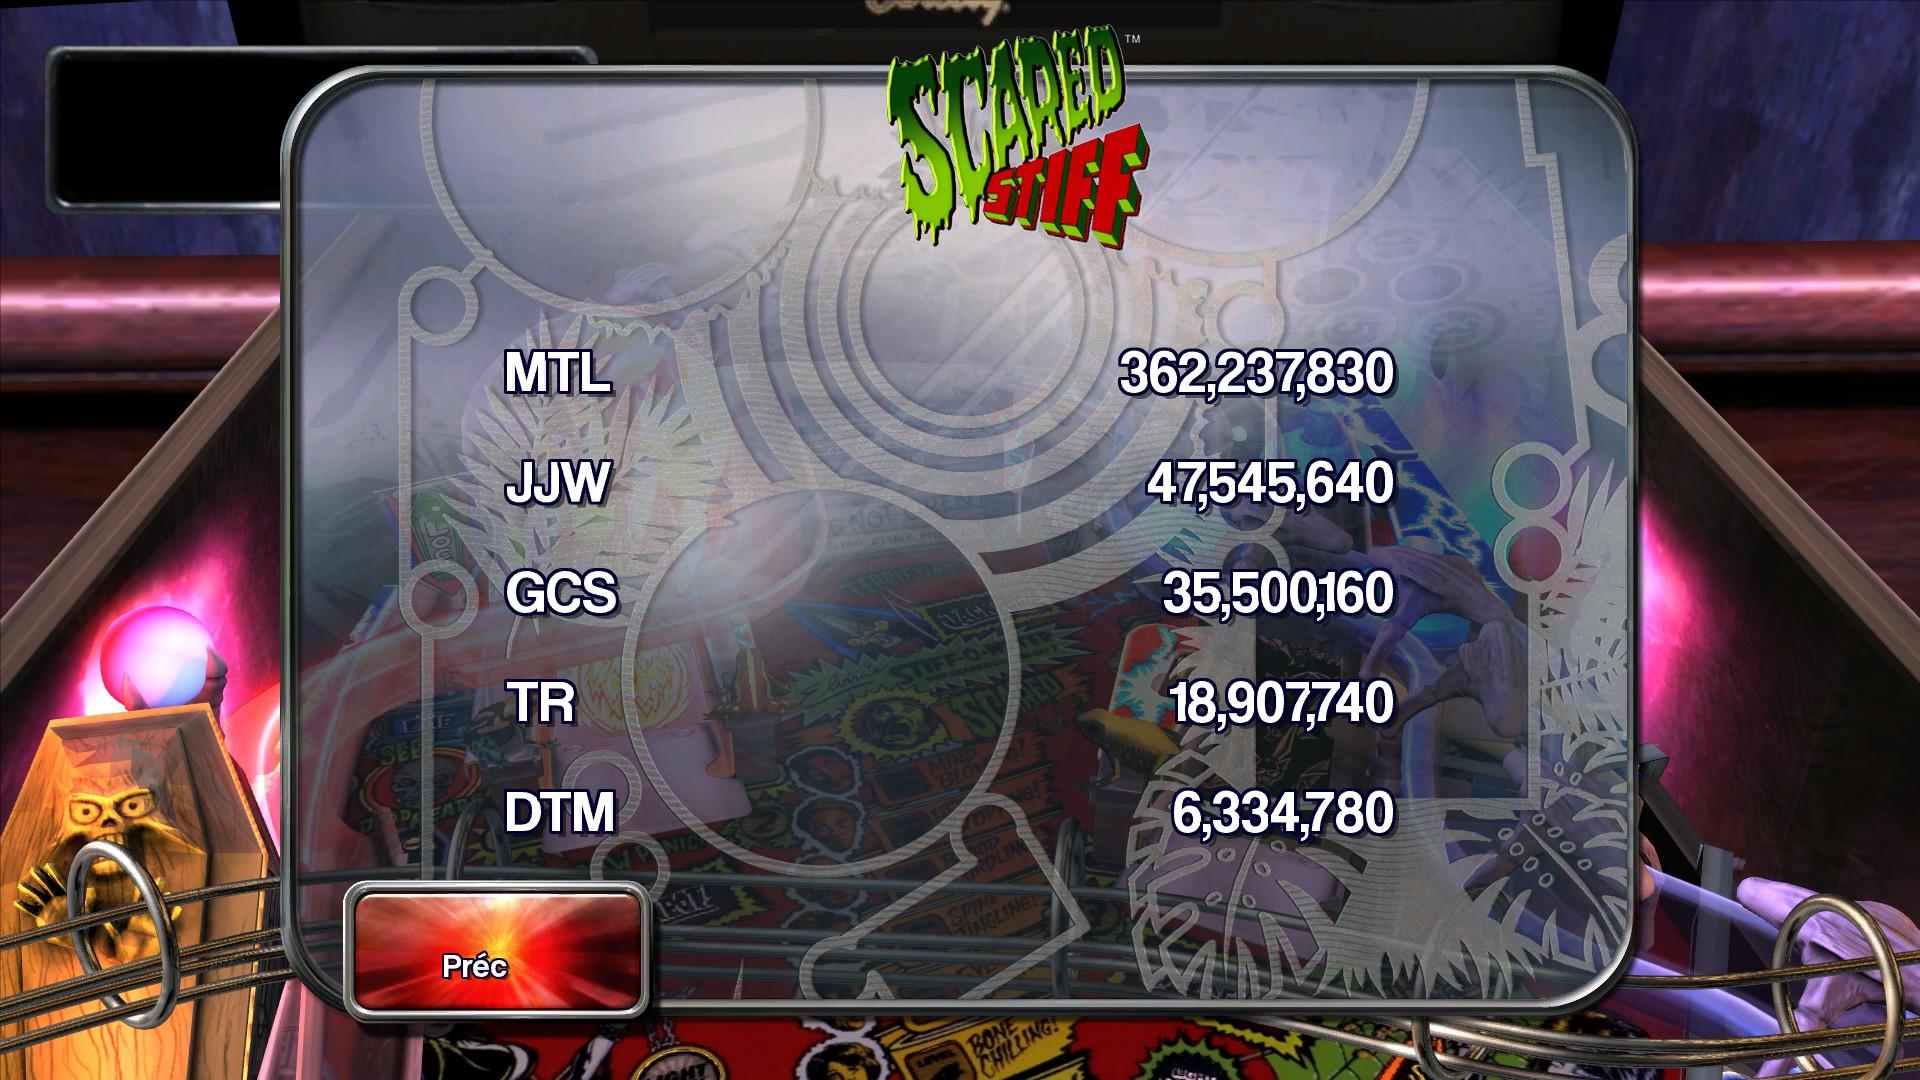 Mantalow: Pinball Arcade: Scared Stiff (PC) 362,237,830 points on 2015-08-29 11:10:41